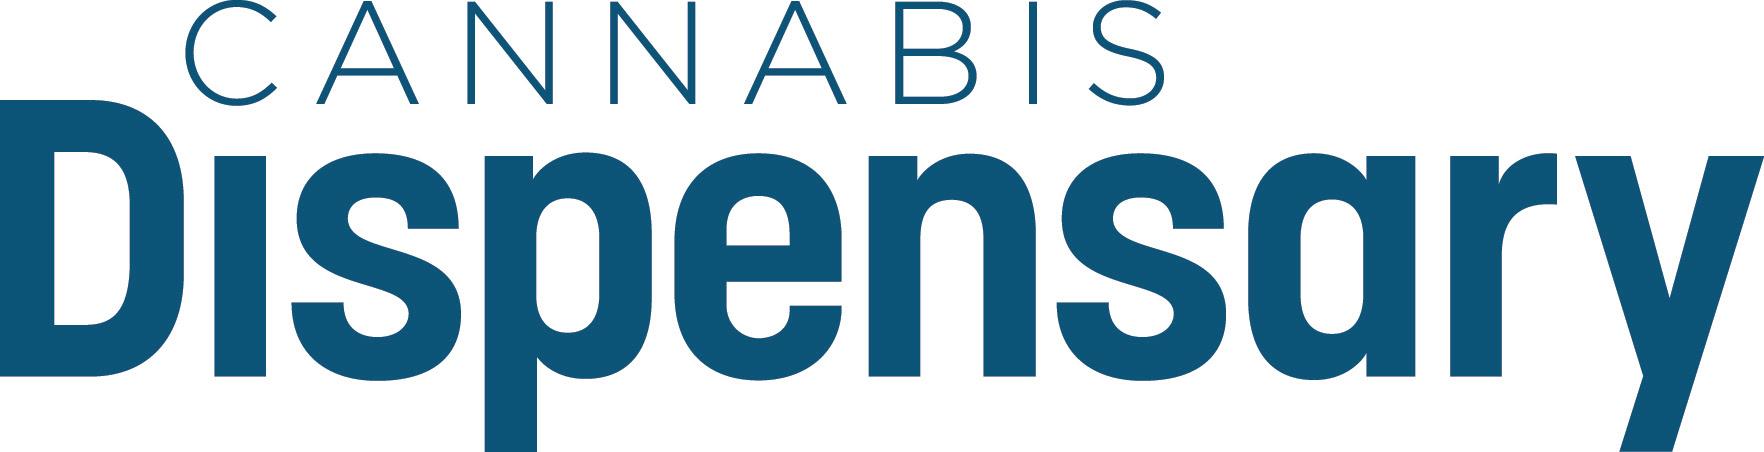 Cannabis Dsipensary logo